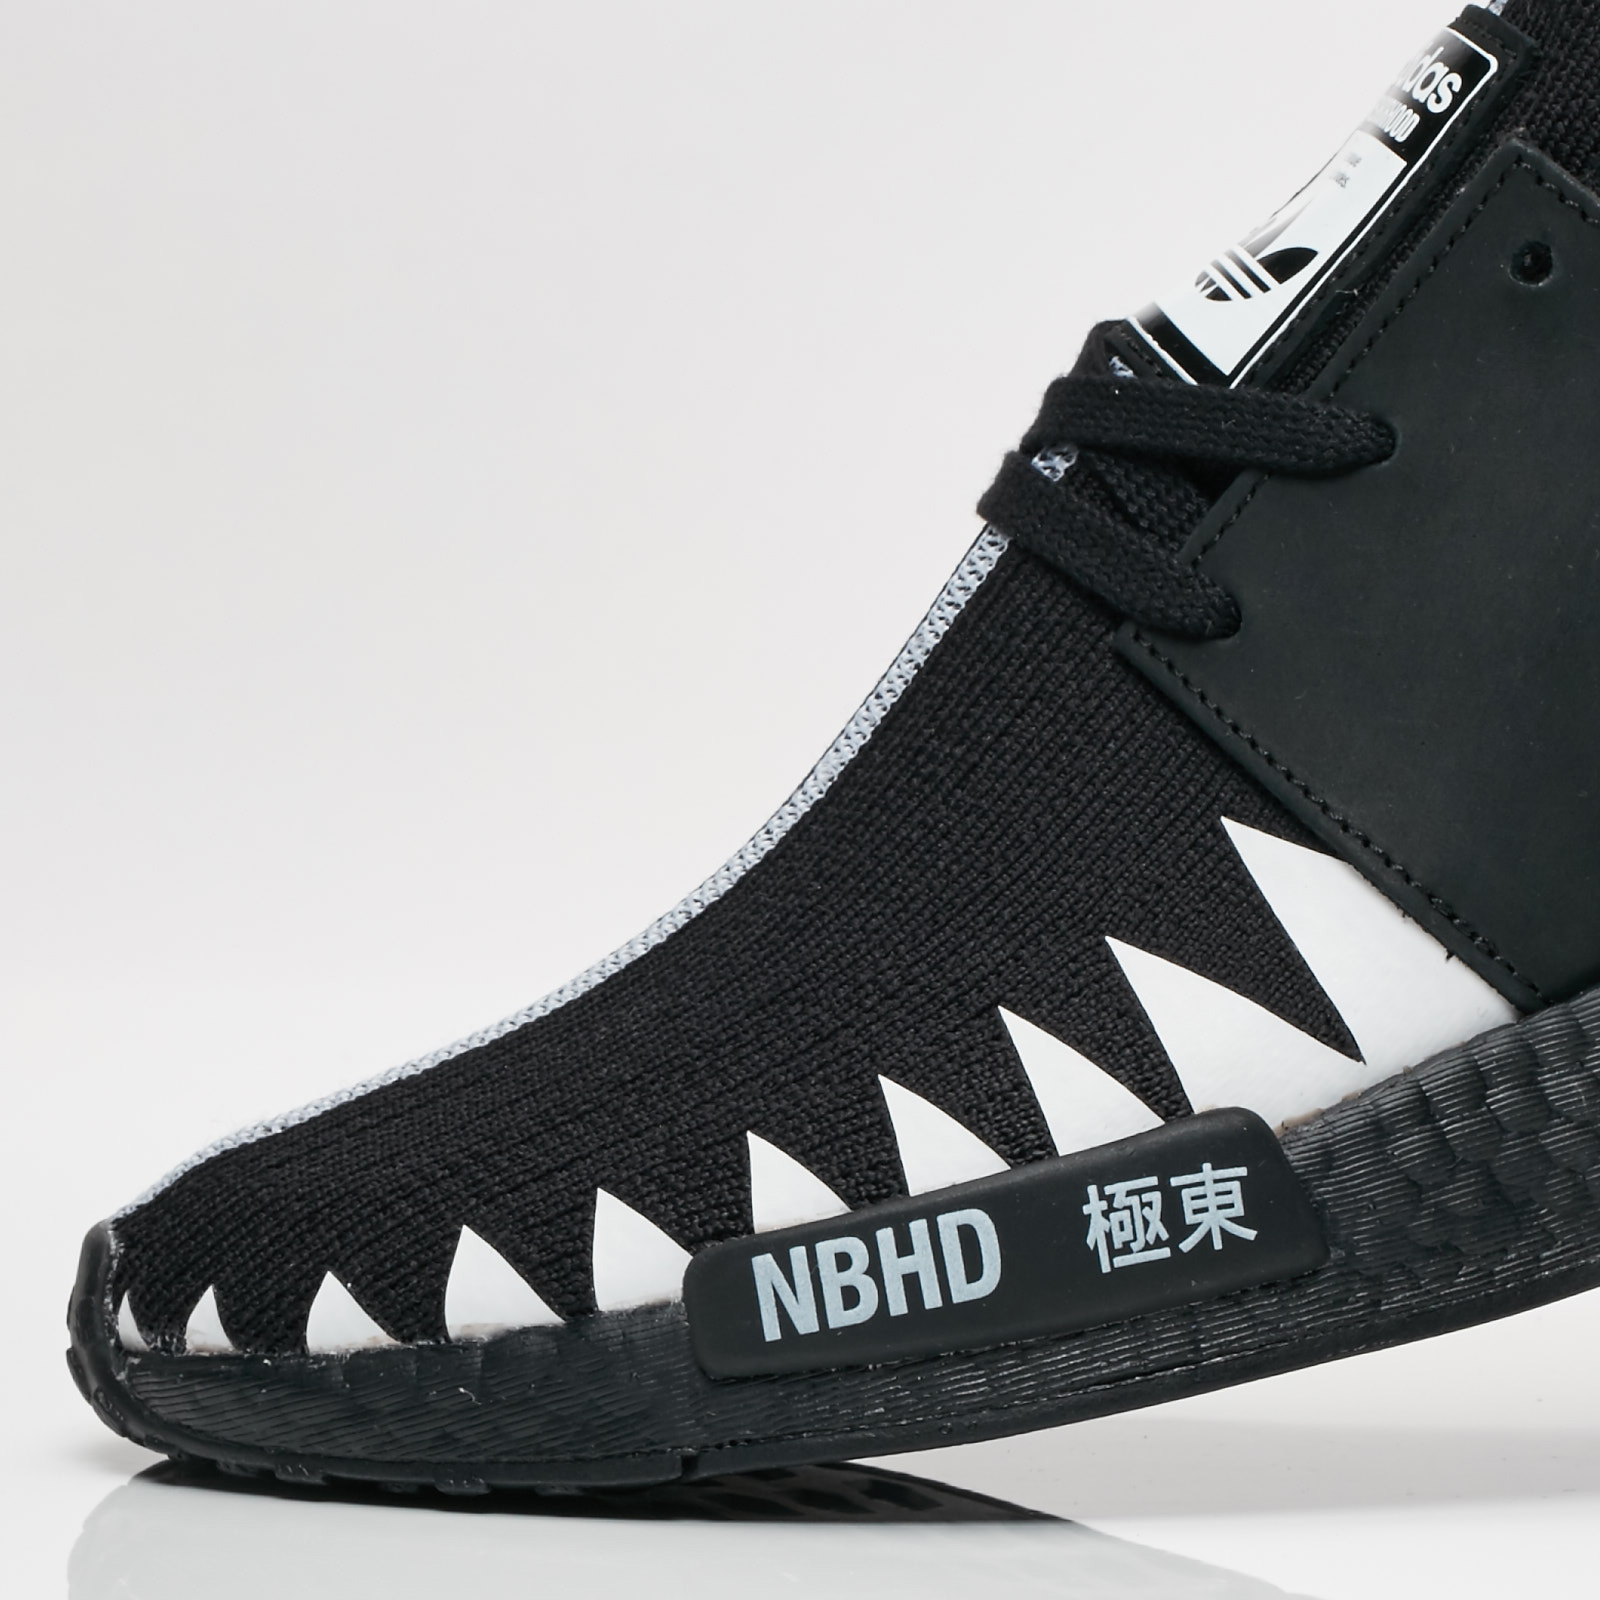 huge discount ddf17 9d8bc adidas NMD R1 PK x Neighborhood - Da8835 - Sneakersnstuff ...